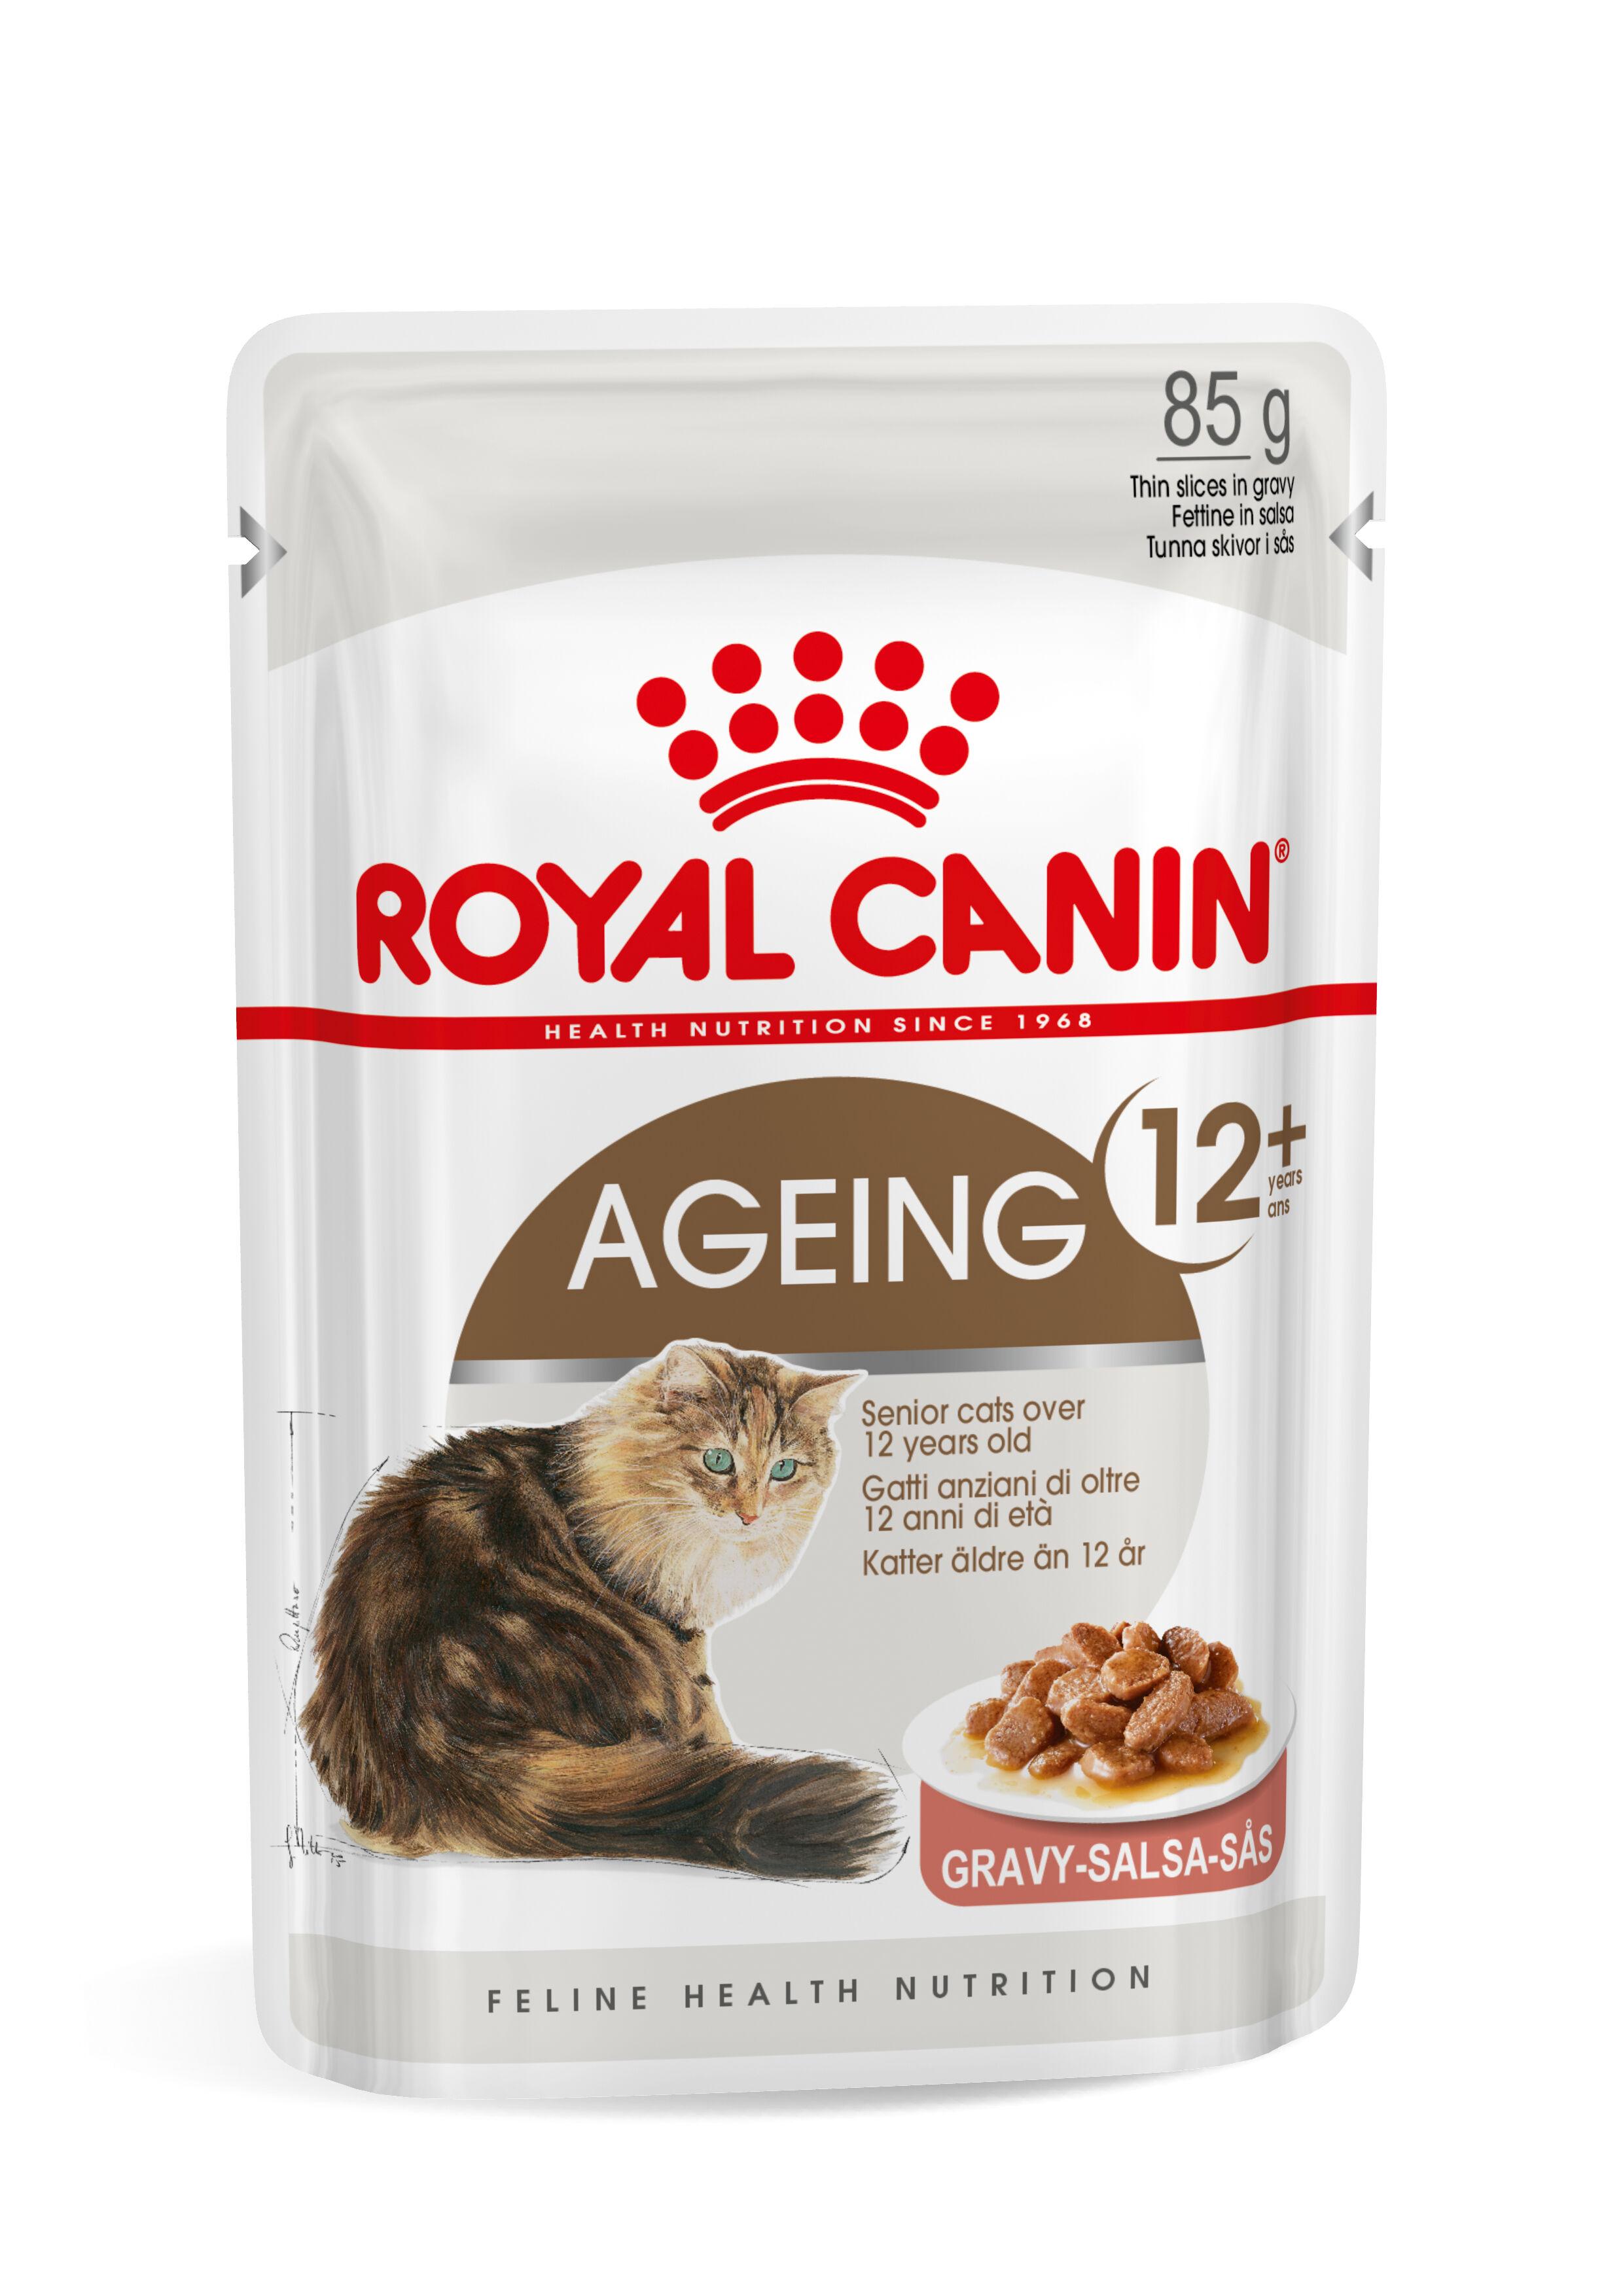 Royal Canin Ageing 12+ pour chat x12 sachets 2x Sauce + 2x Gelée (48x85 gr)